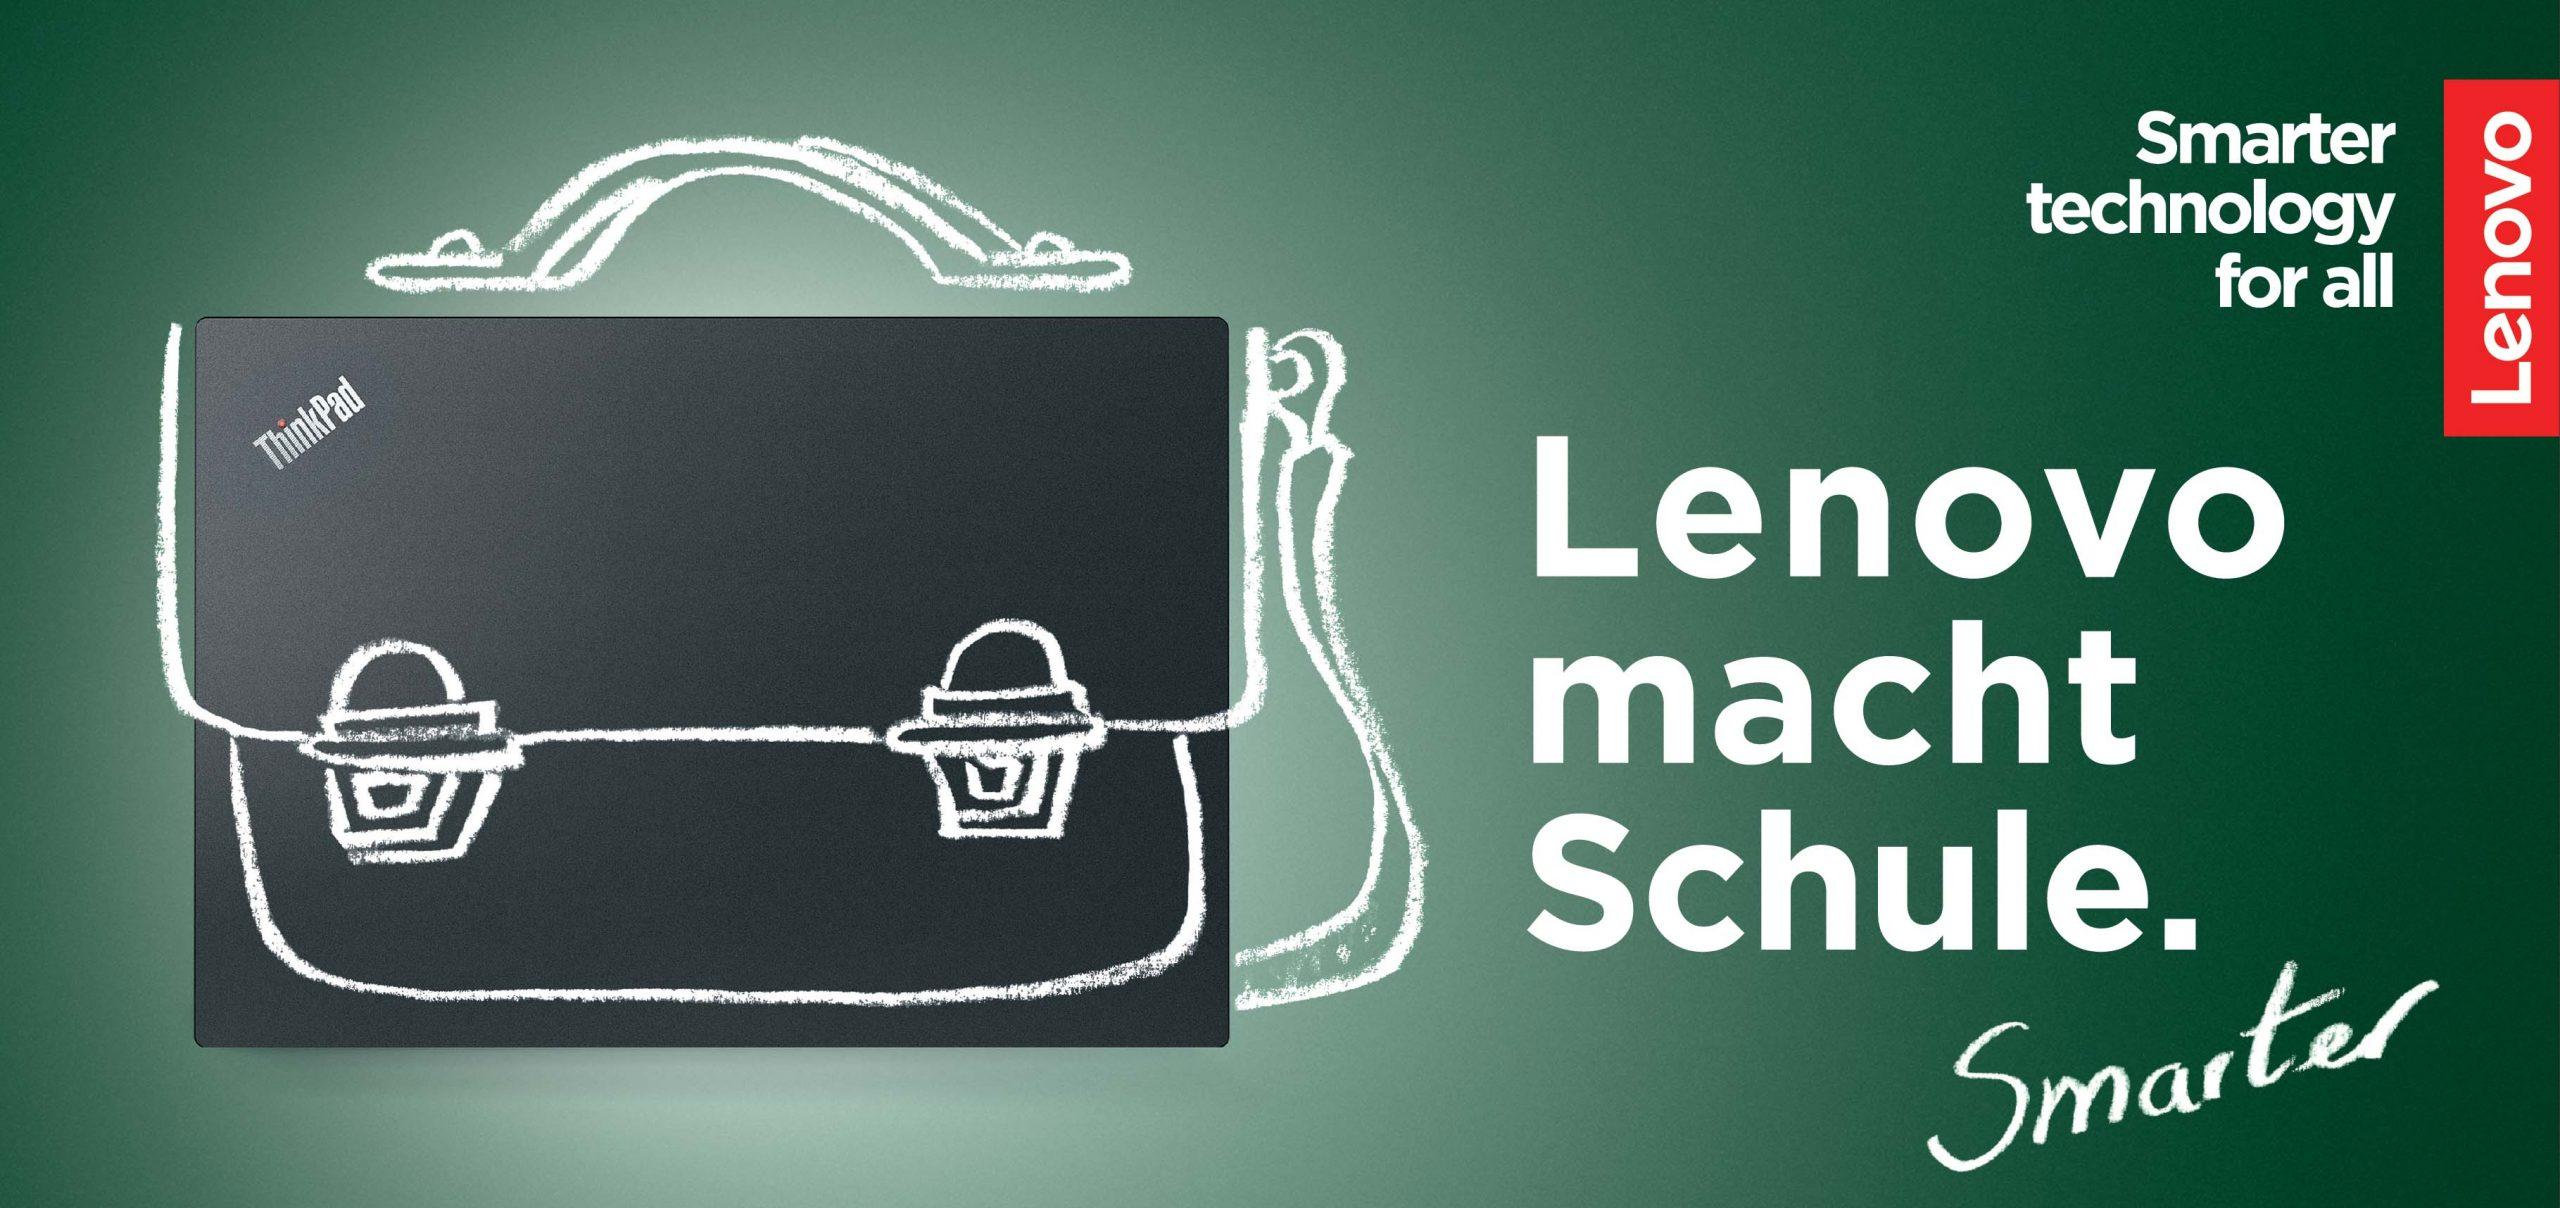 URANO_Lenovo macht Schule smarter Header